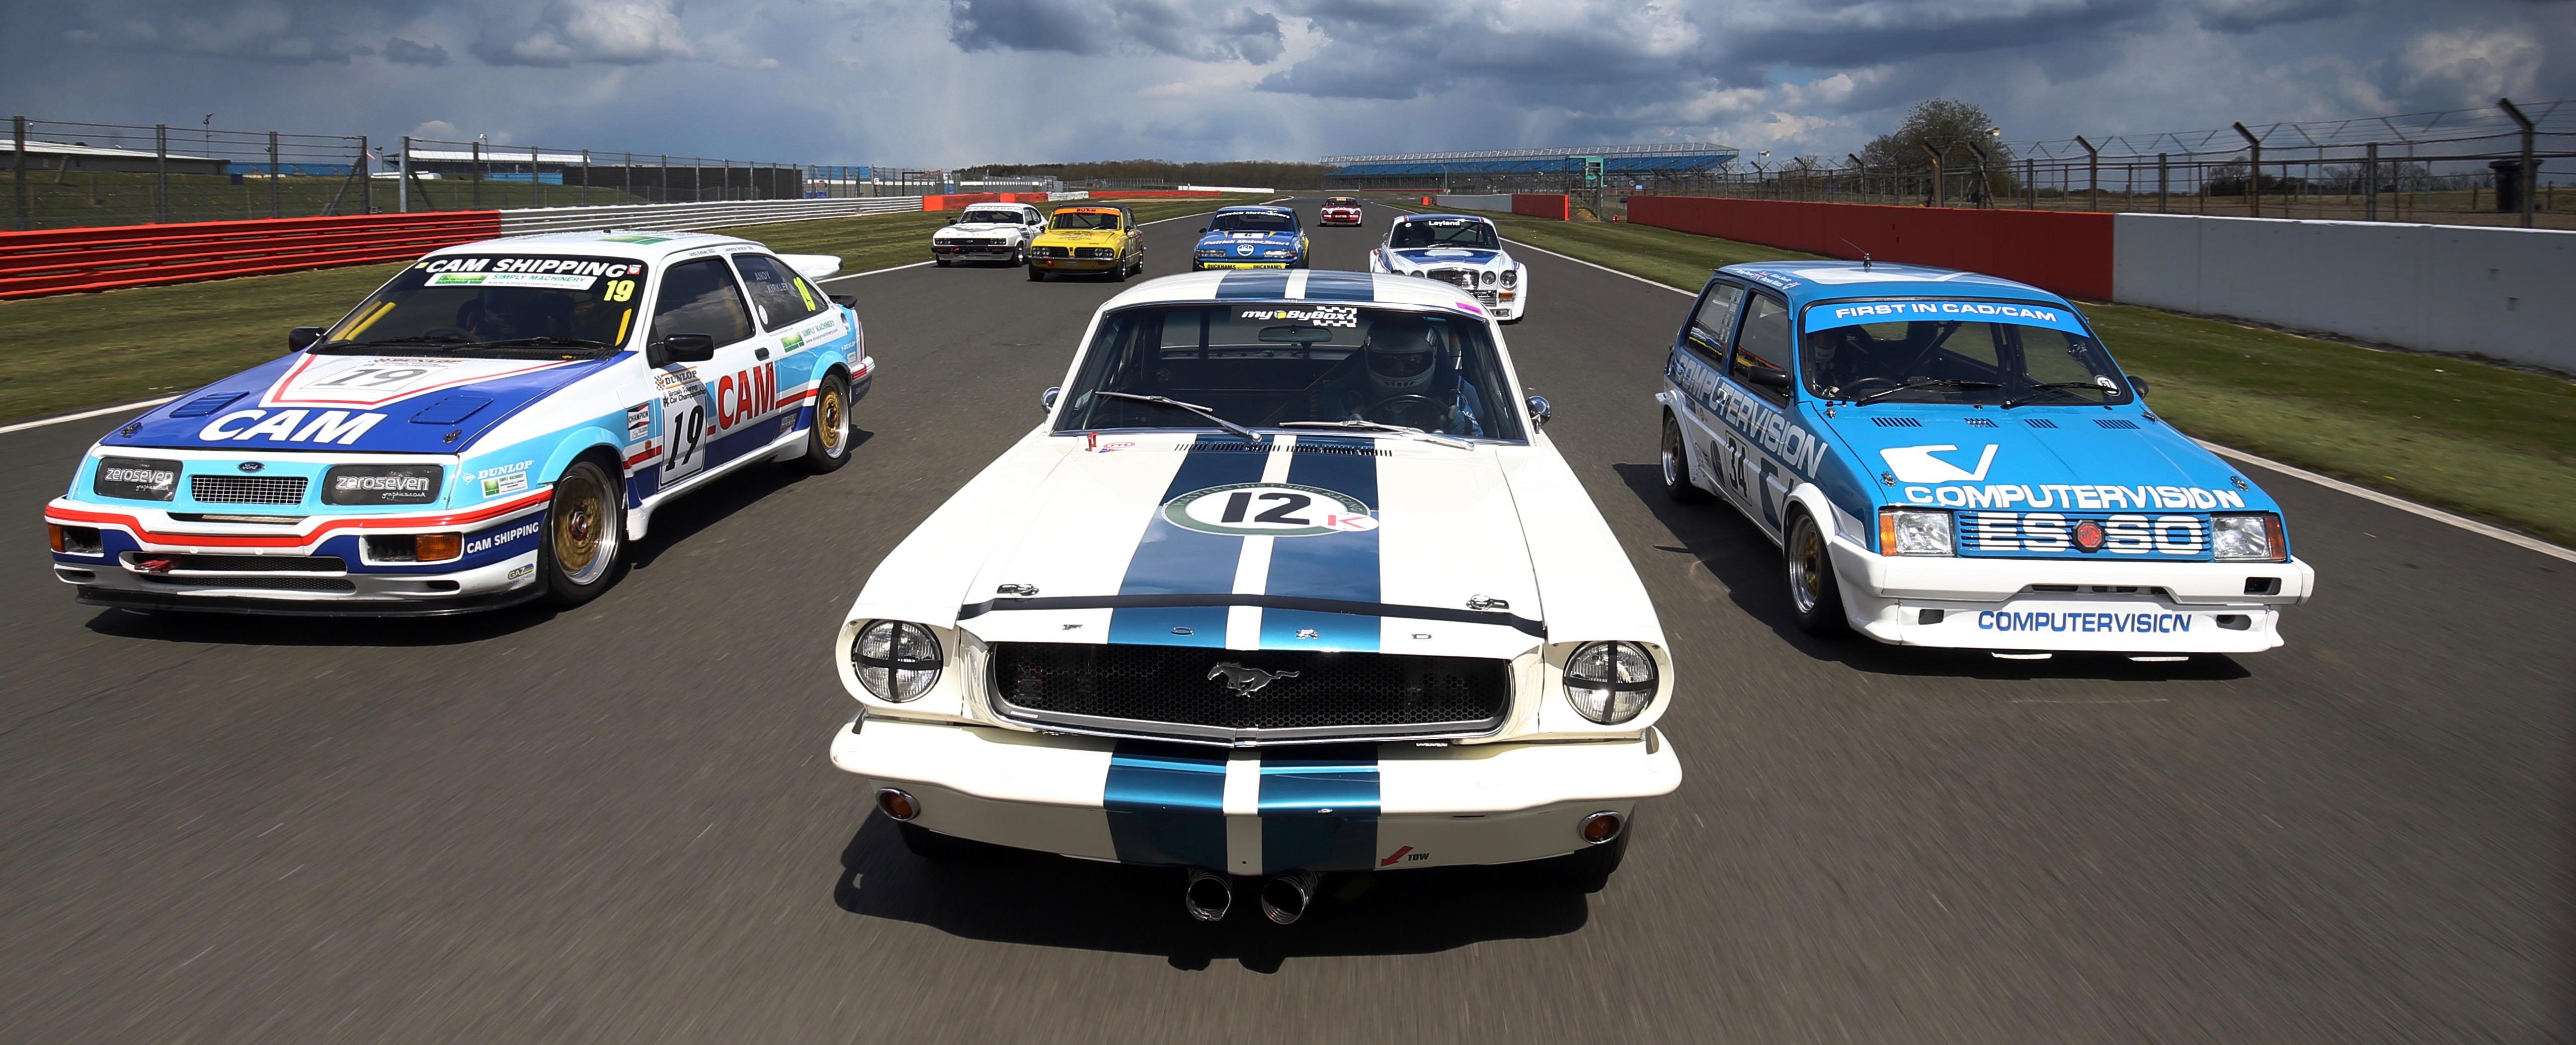 , British Touring Car Championship celebrates its 60th anniversary, ClassicCars.com Journal